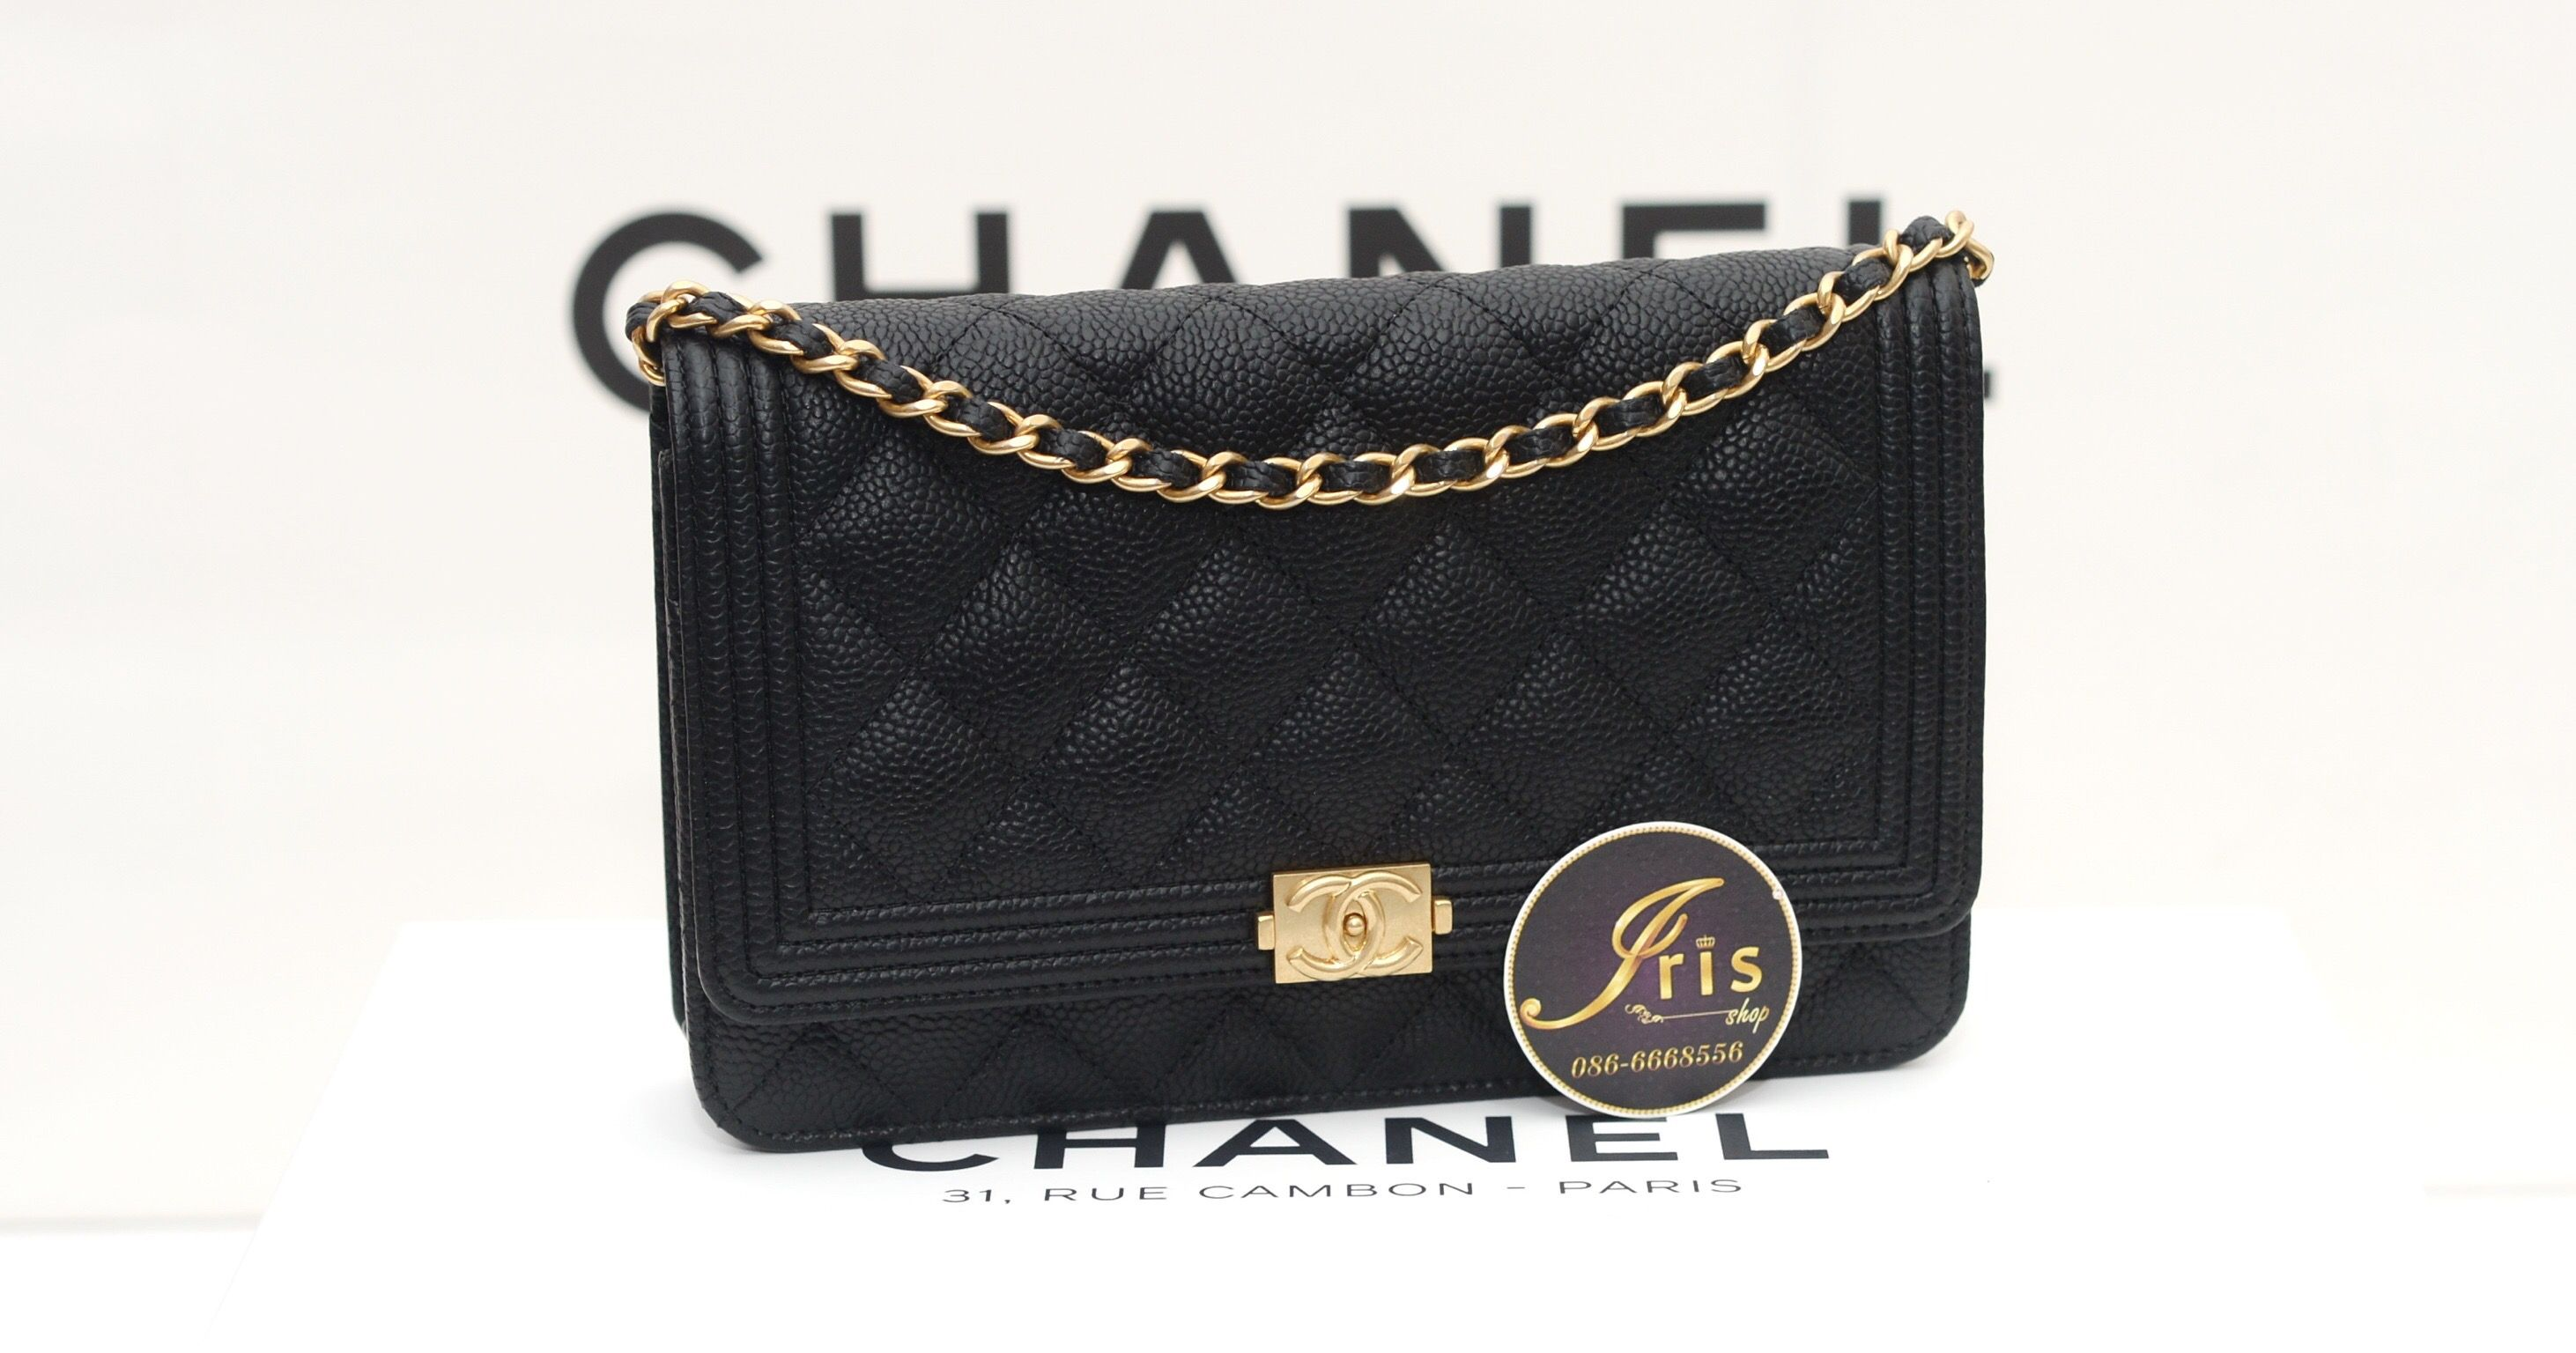 8933ddc9b882 กระเป๋า Chanel WOC BoY Black Caviar GHW ของใหม่พร้อมส่ง‼ - Iris Shop